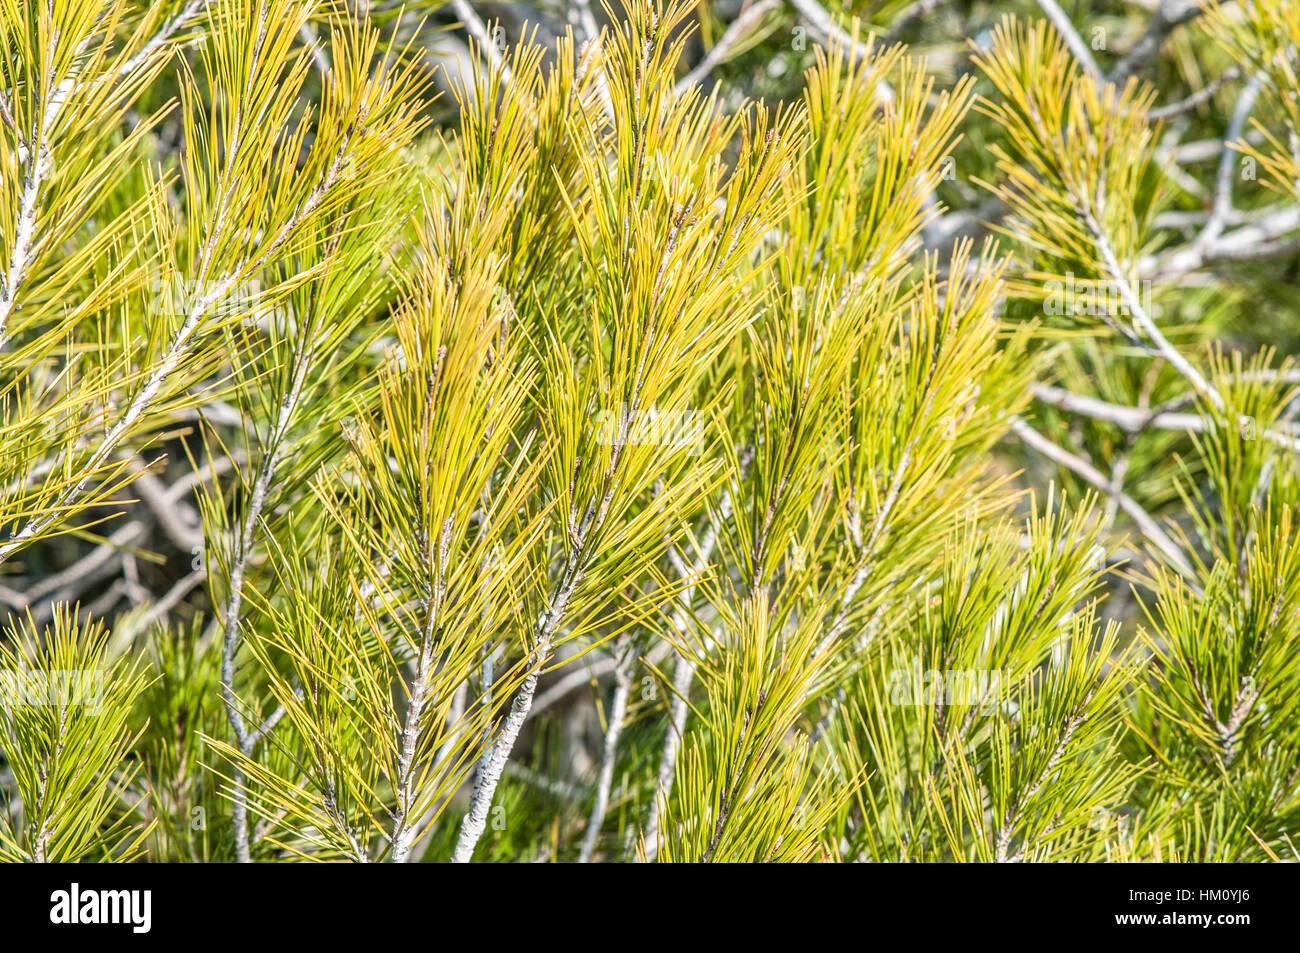 Aleppo pine (Pinus halepensis) leaf - Stock Image